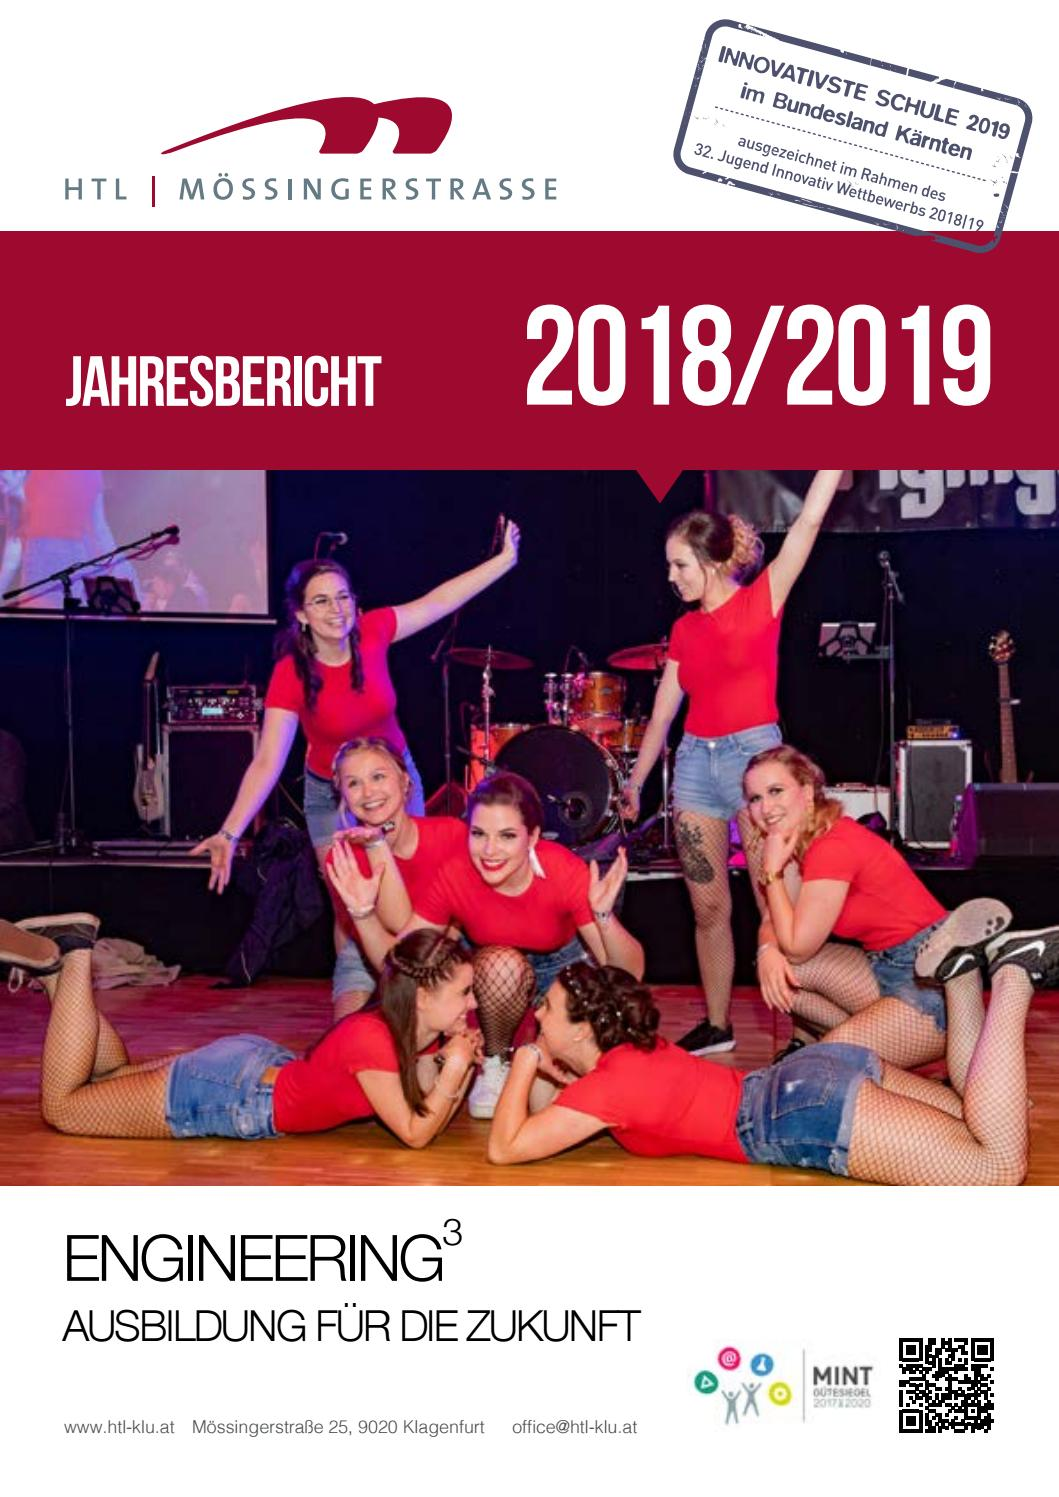 Ybbsitz single night - comunidadelectronica.com / 2020 / Absam frau single